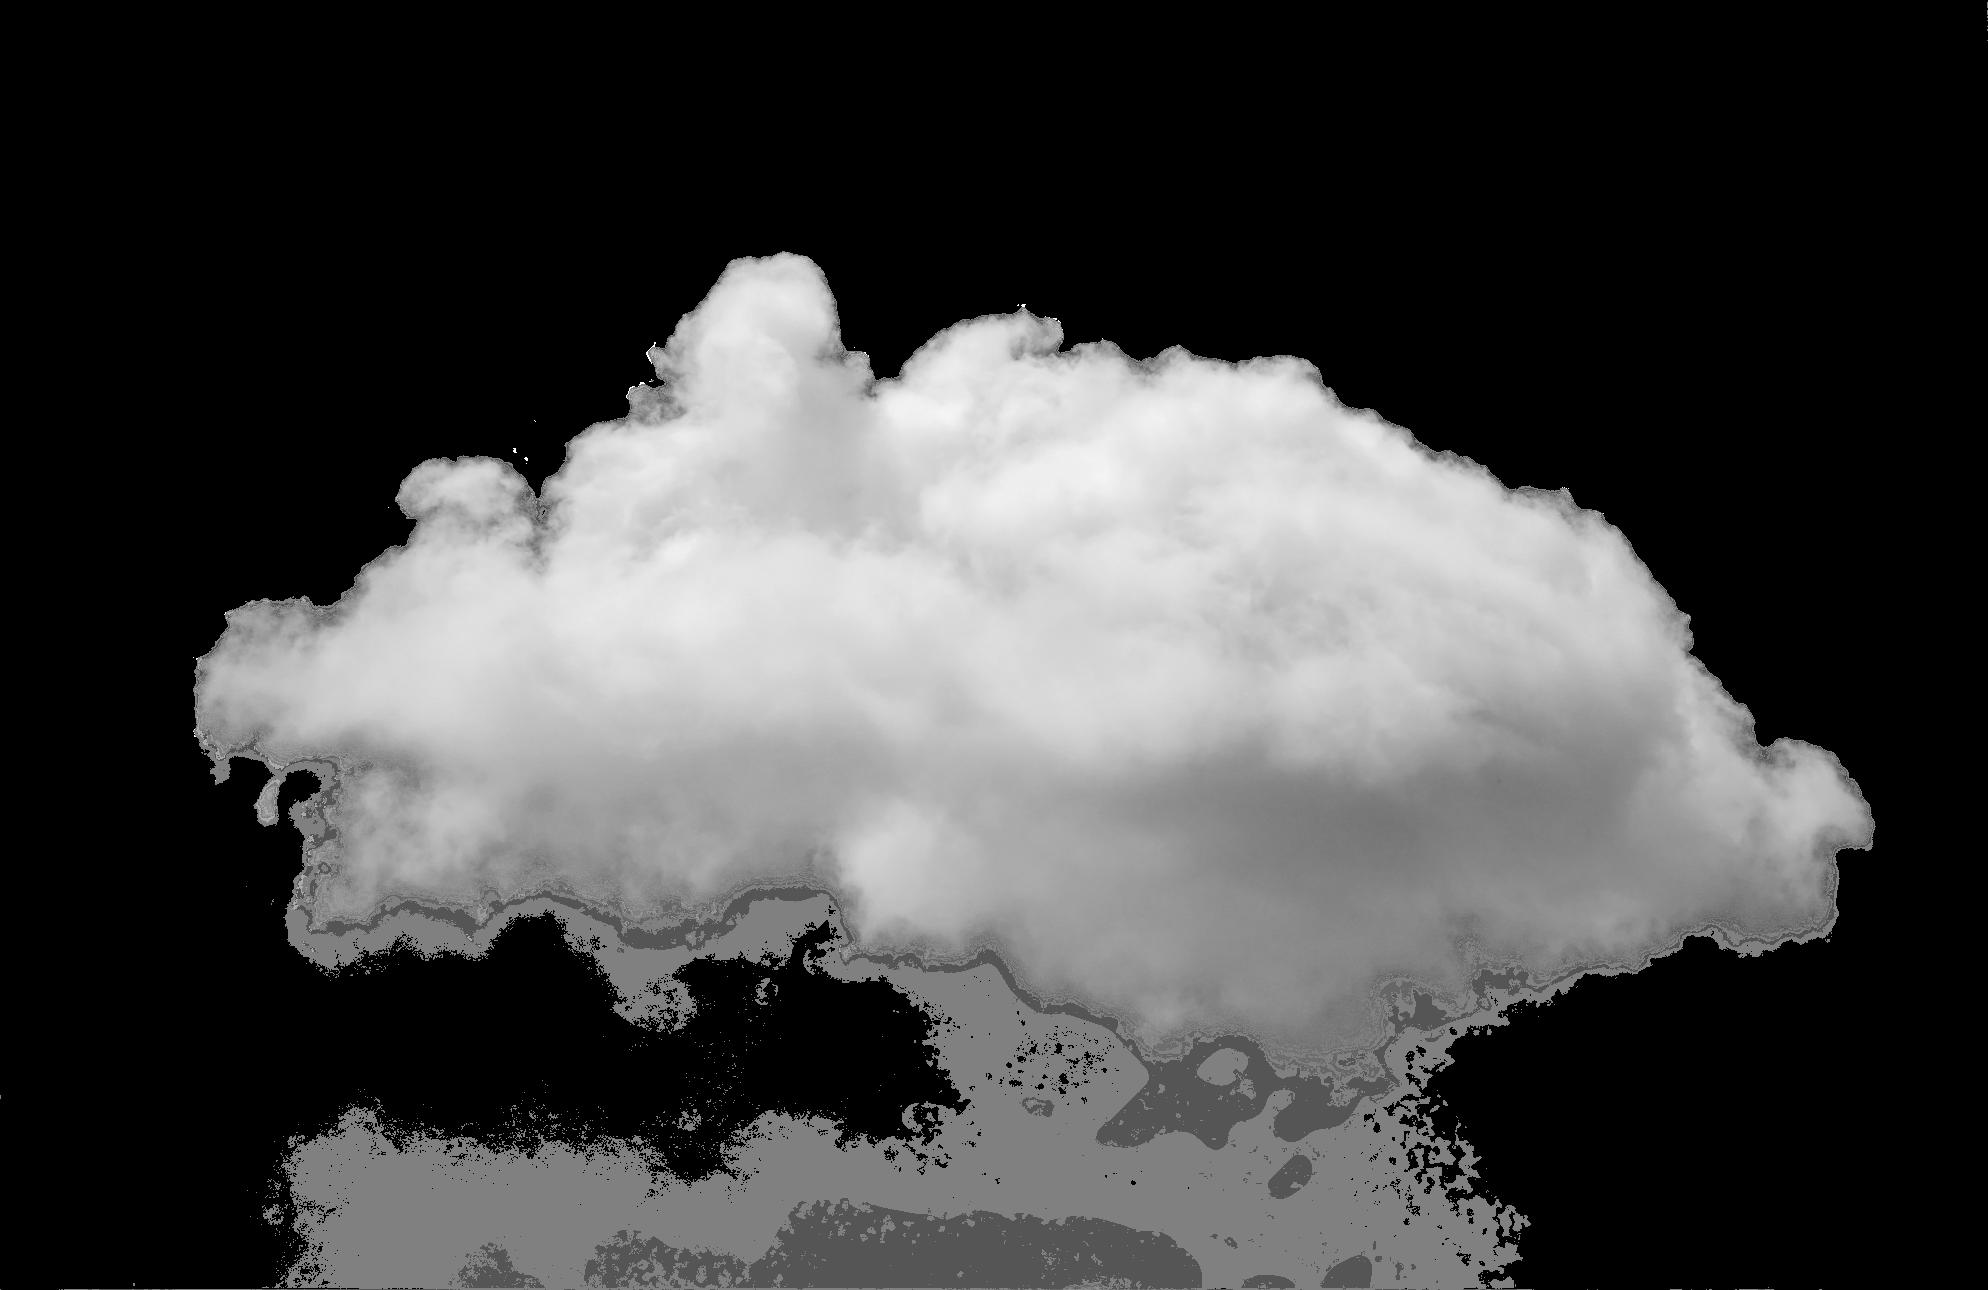 Cloud Texture Png (+).